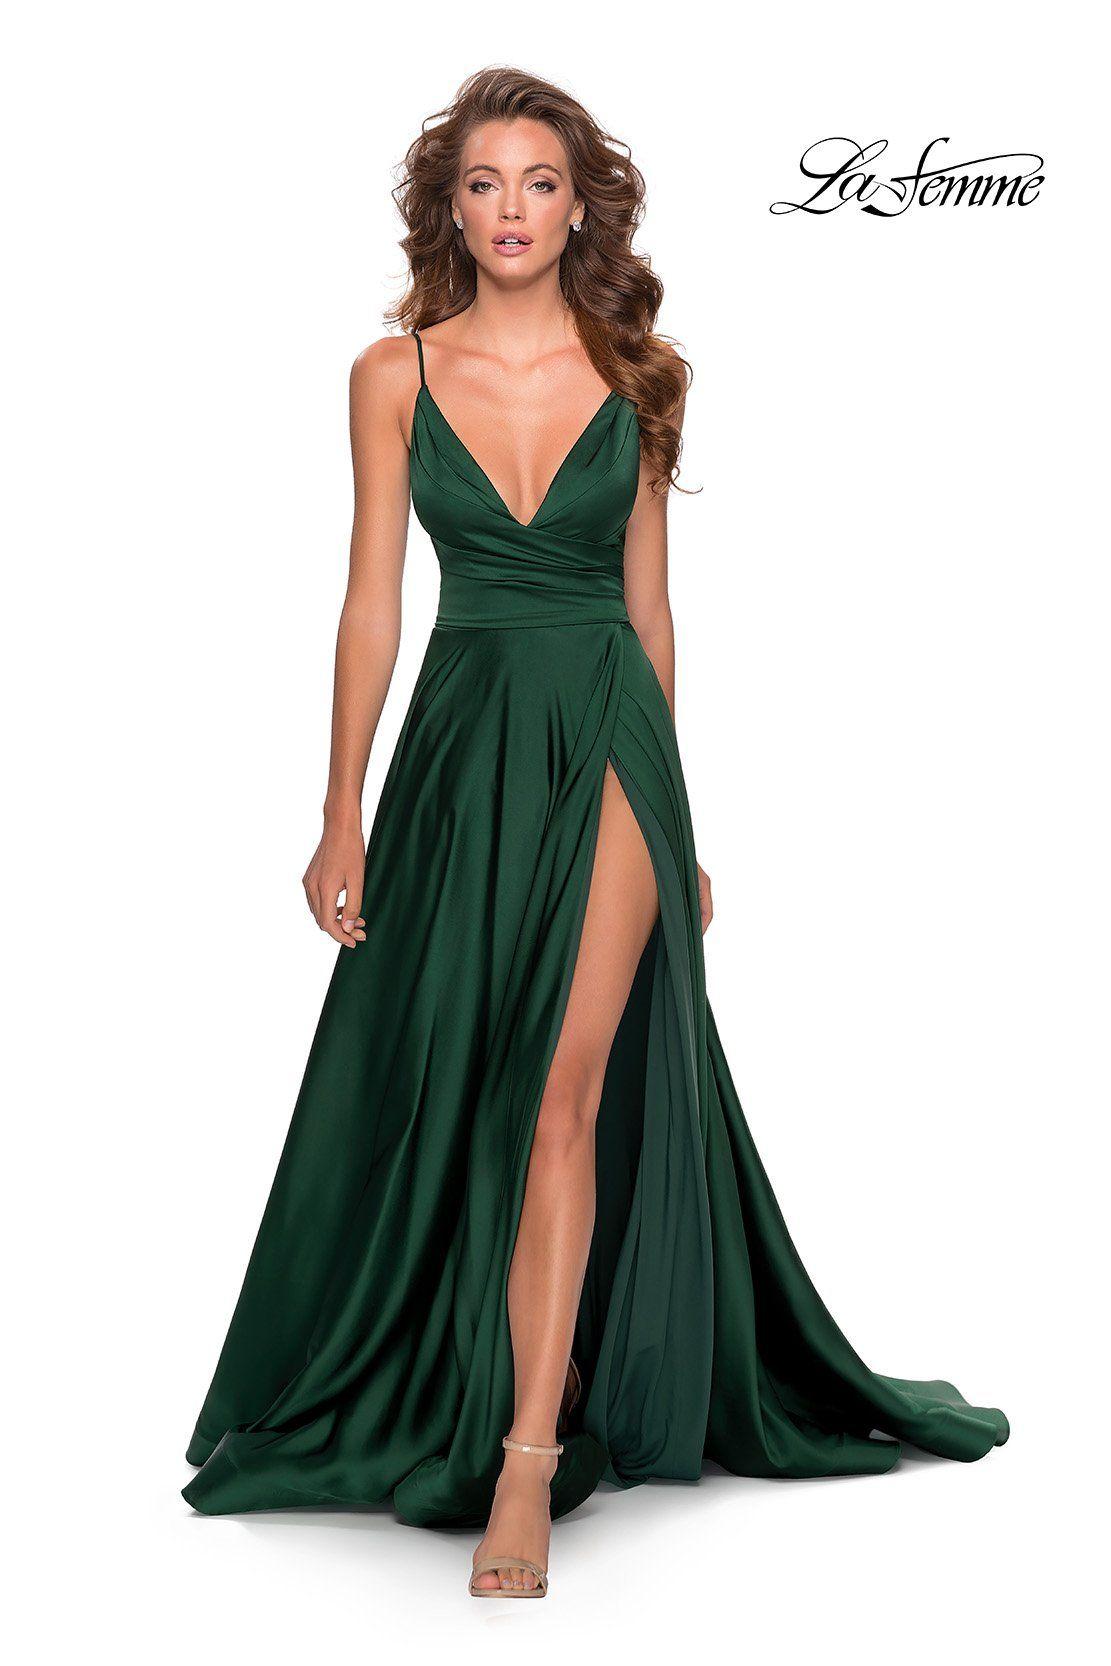 La Femme - 28607 Sleeveless Deep V Neck High Leg S